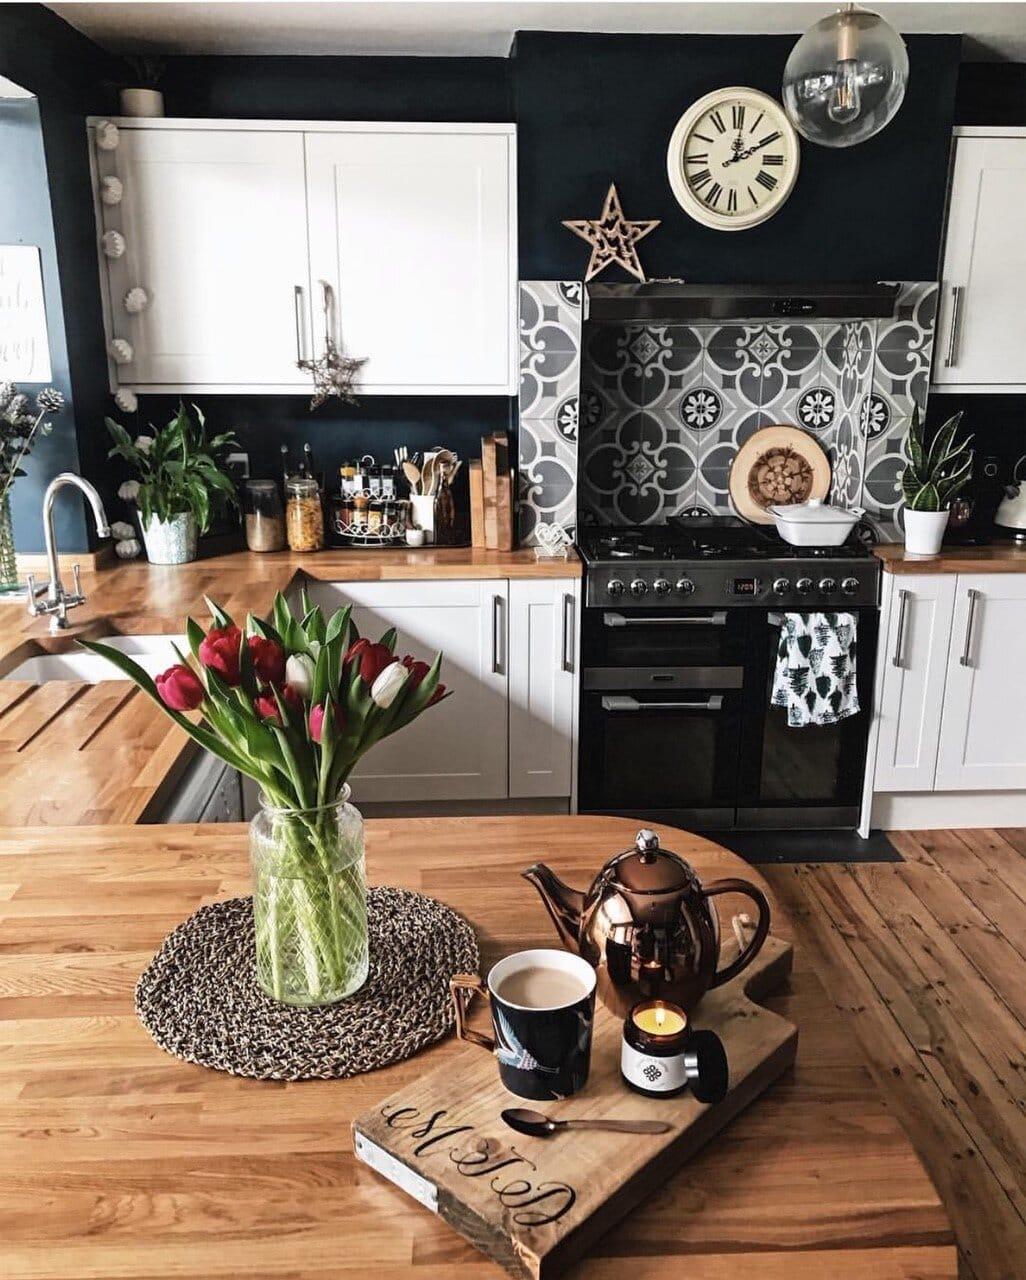 interior design, instagram, instagram trends, home decor, social media, blogging, instagram advice, blogging advice, pinterest, kitchen, tulips